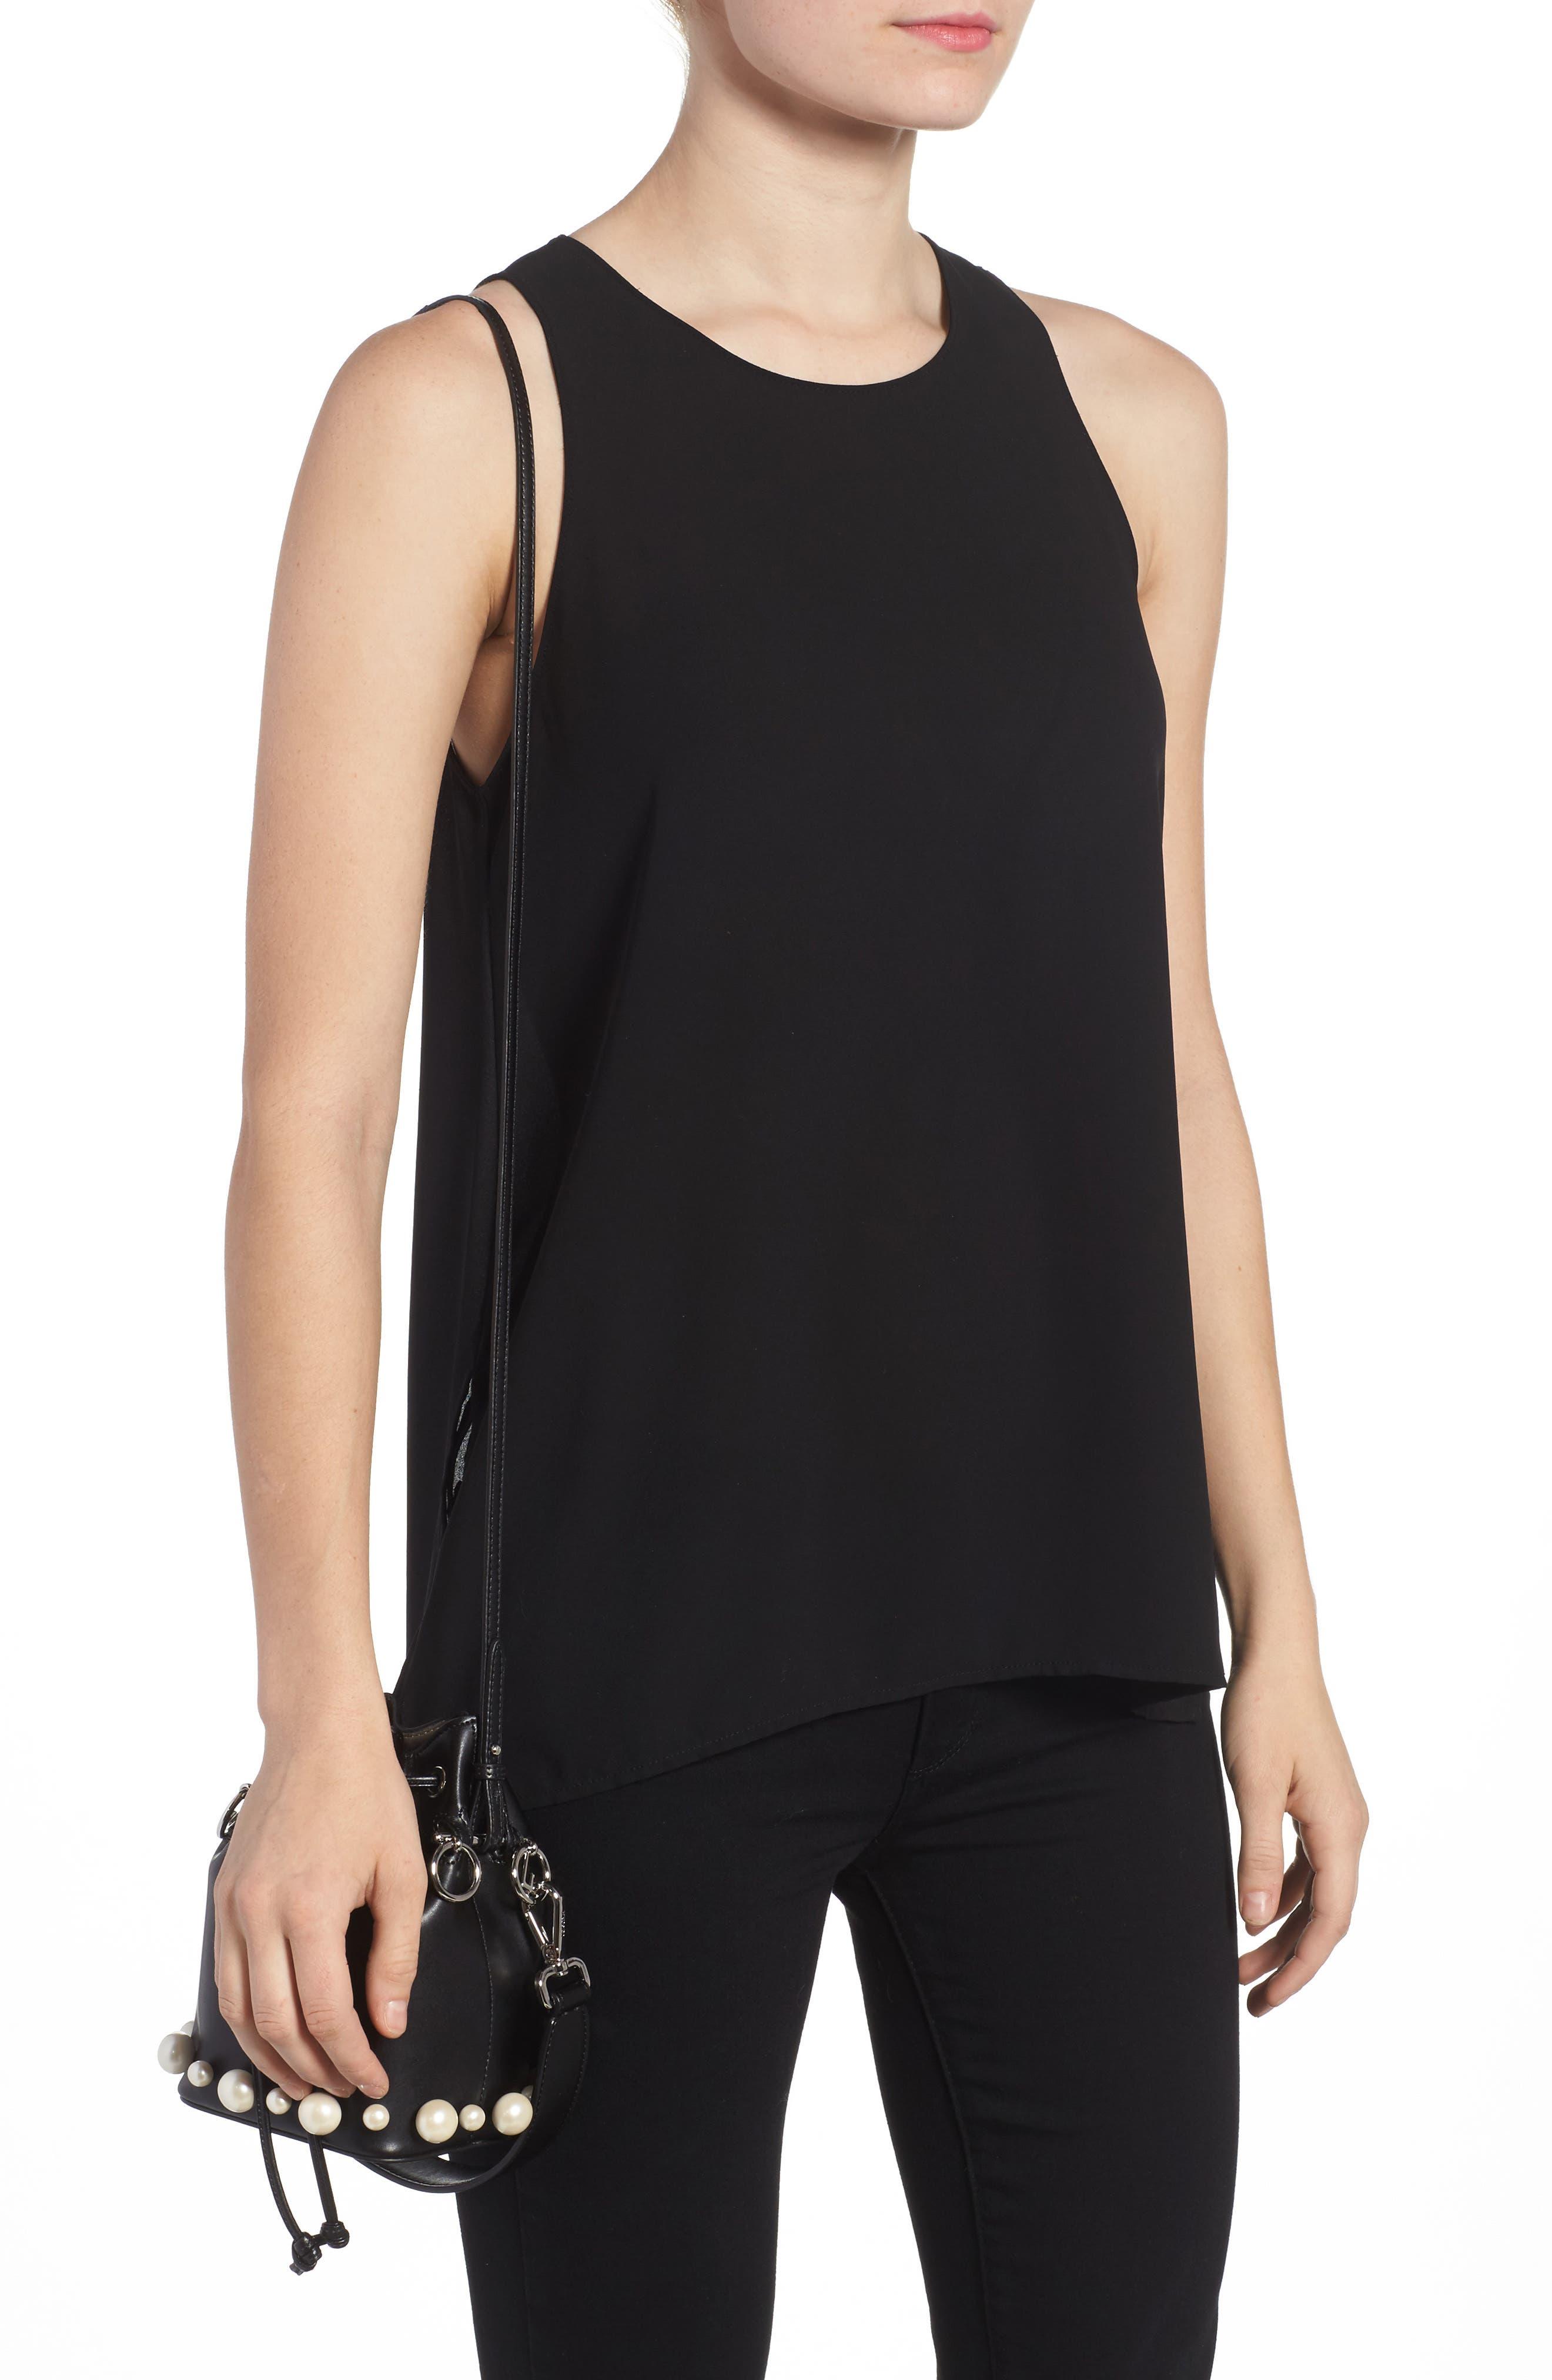 FENDI, Imitation Pearl Calfskin Bucket Bag, Alternate thumbnail 2, color, BLACK